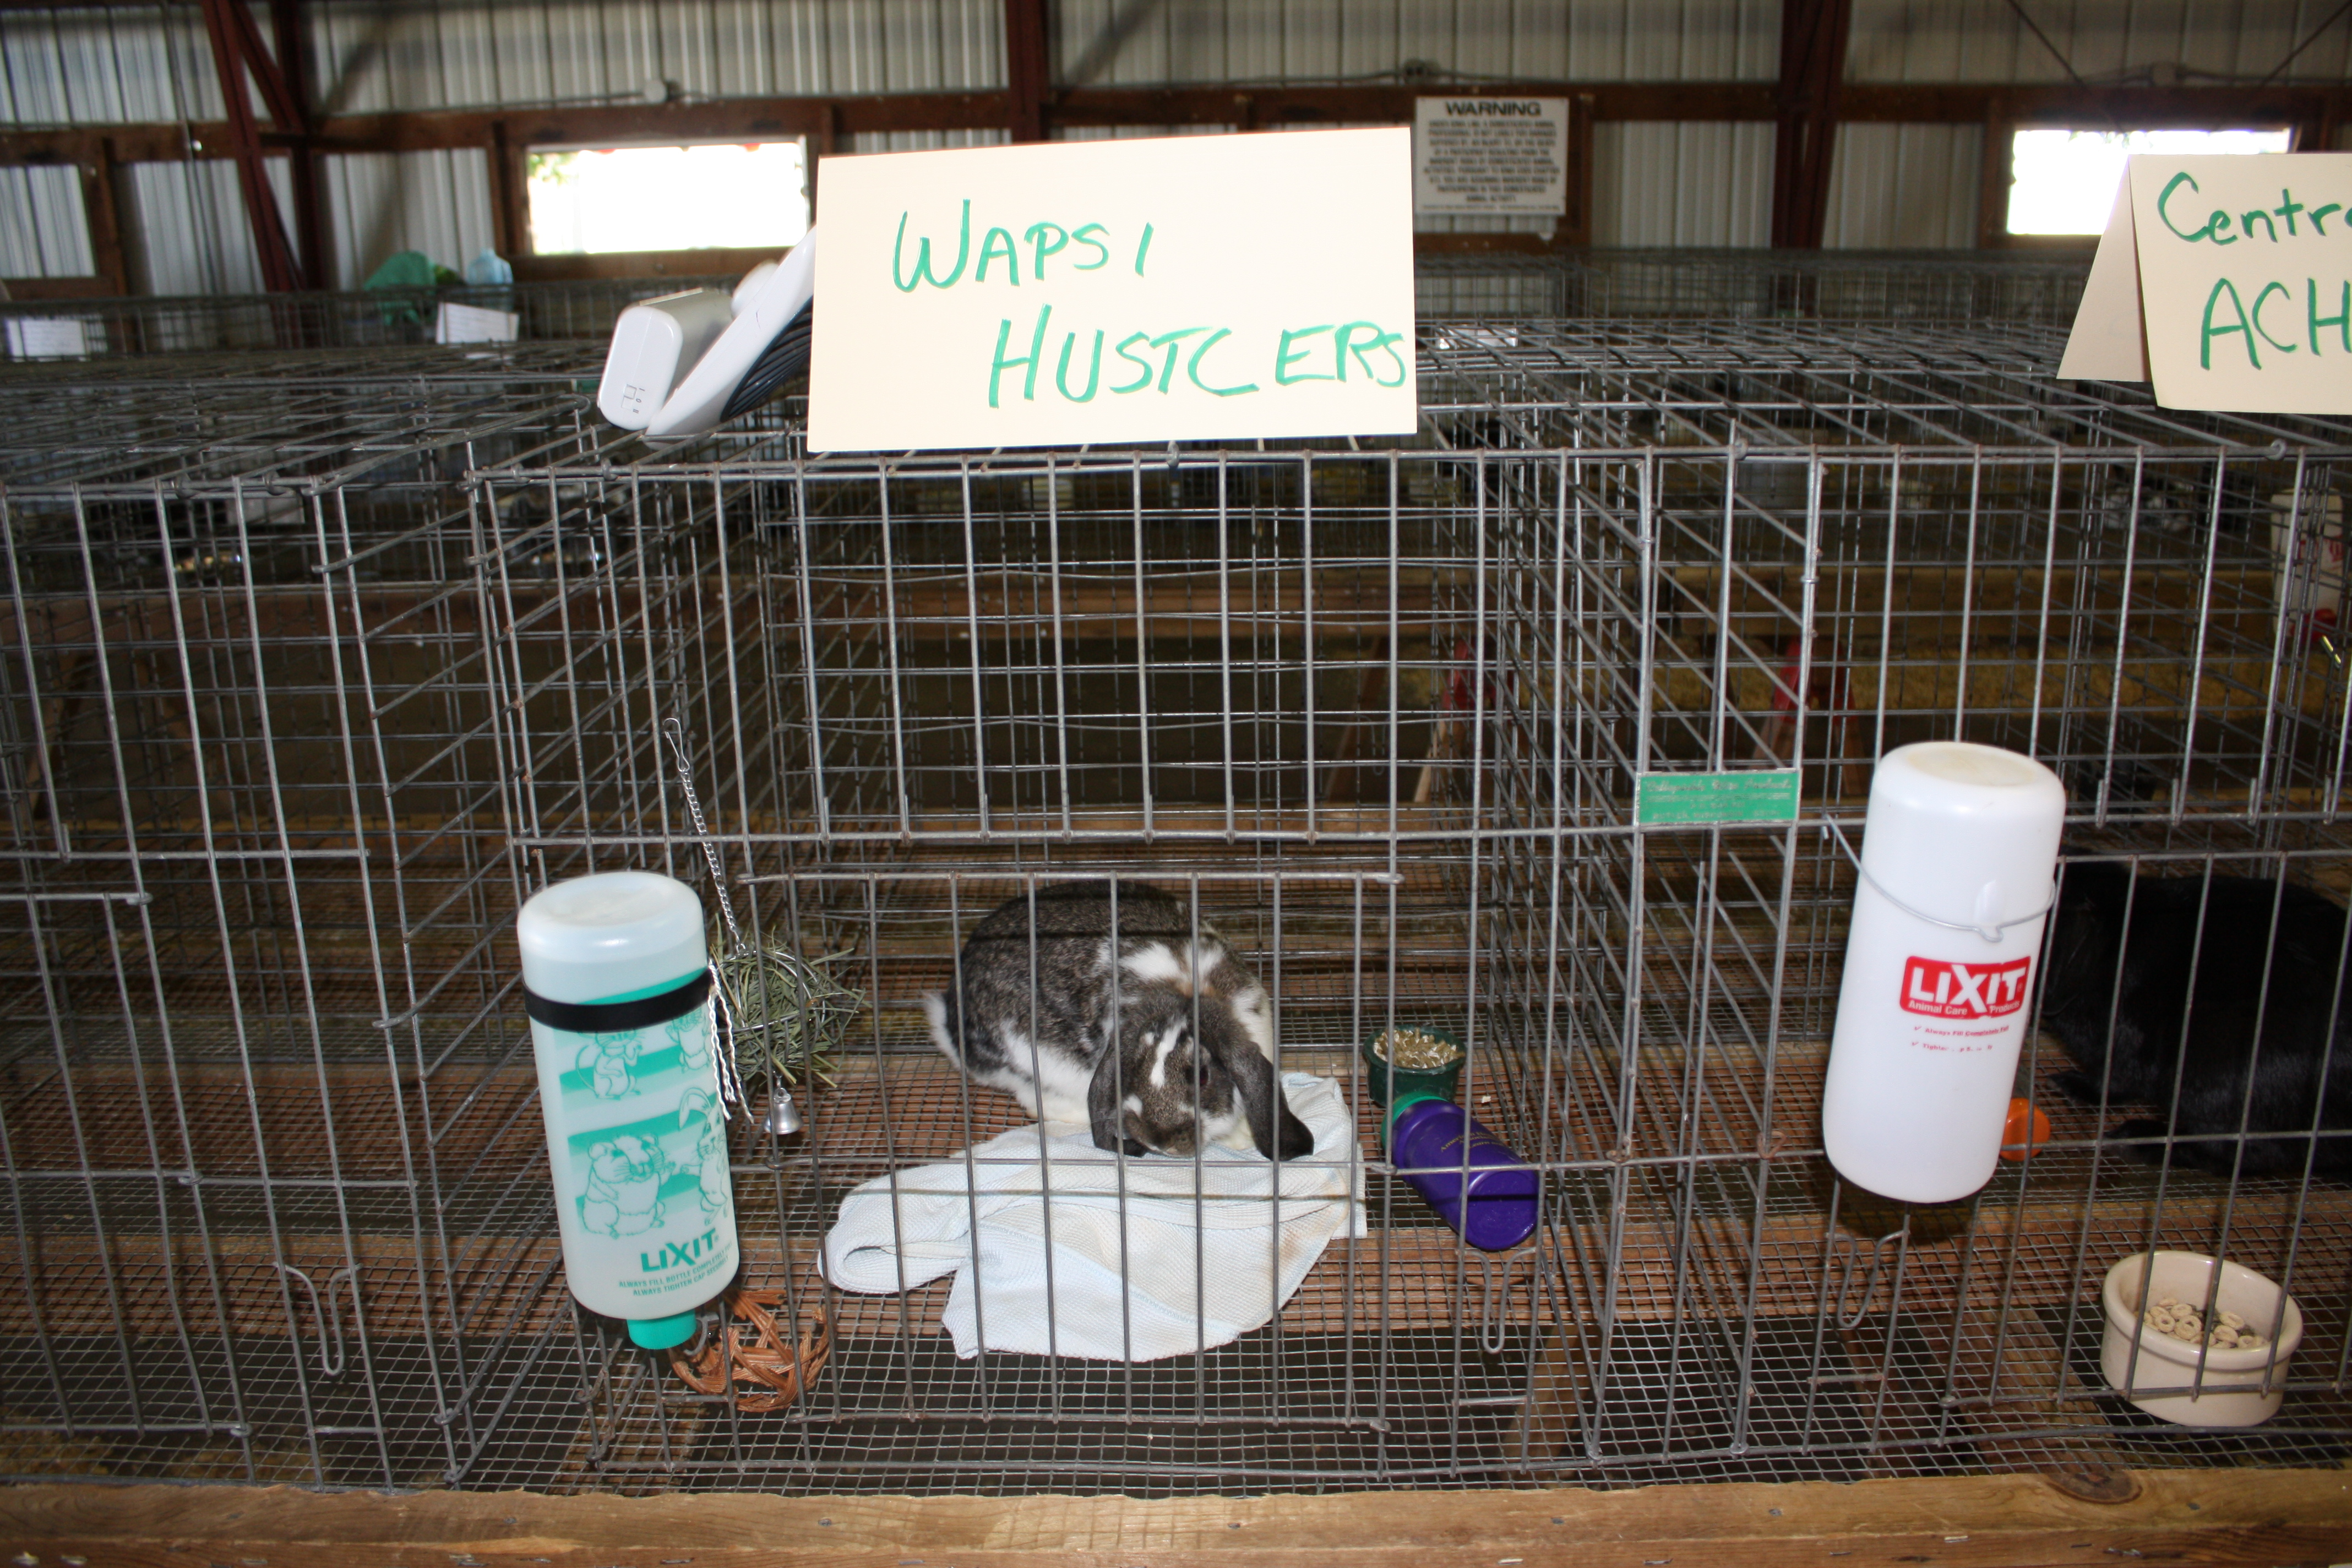 4 H Ffa Rabbit Cavy Winners Announced